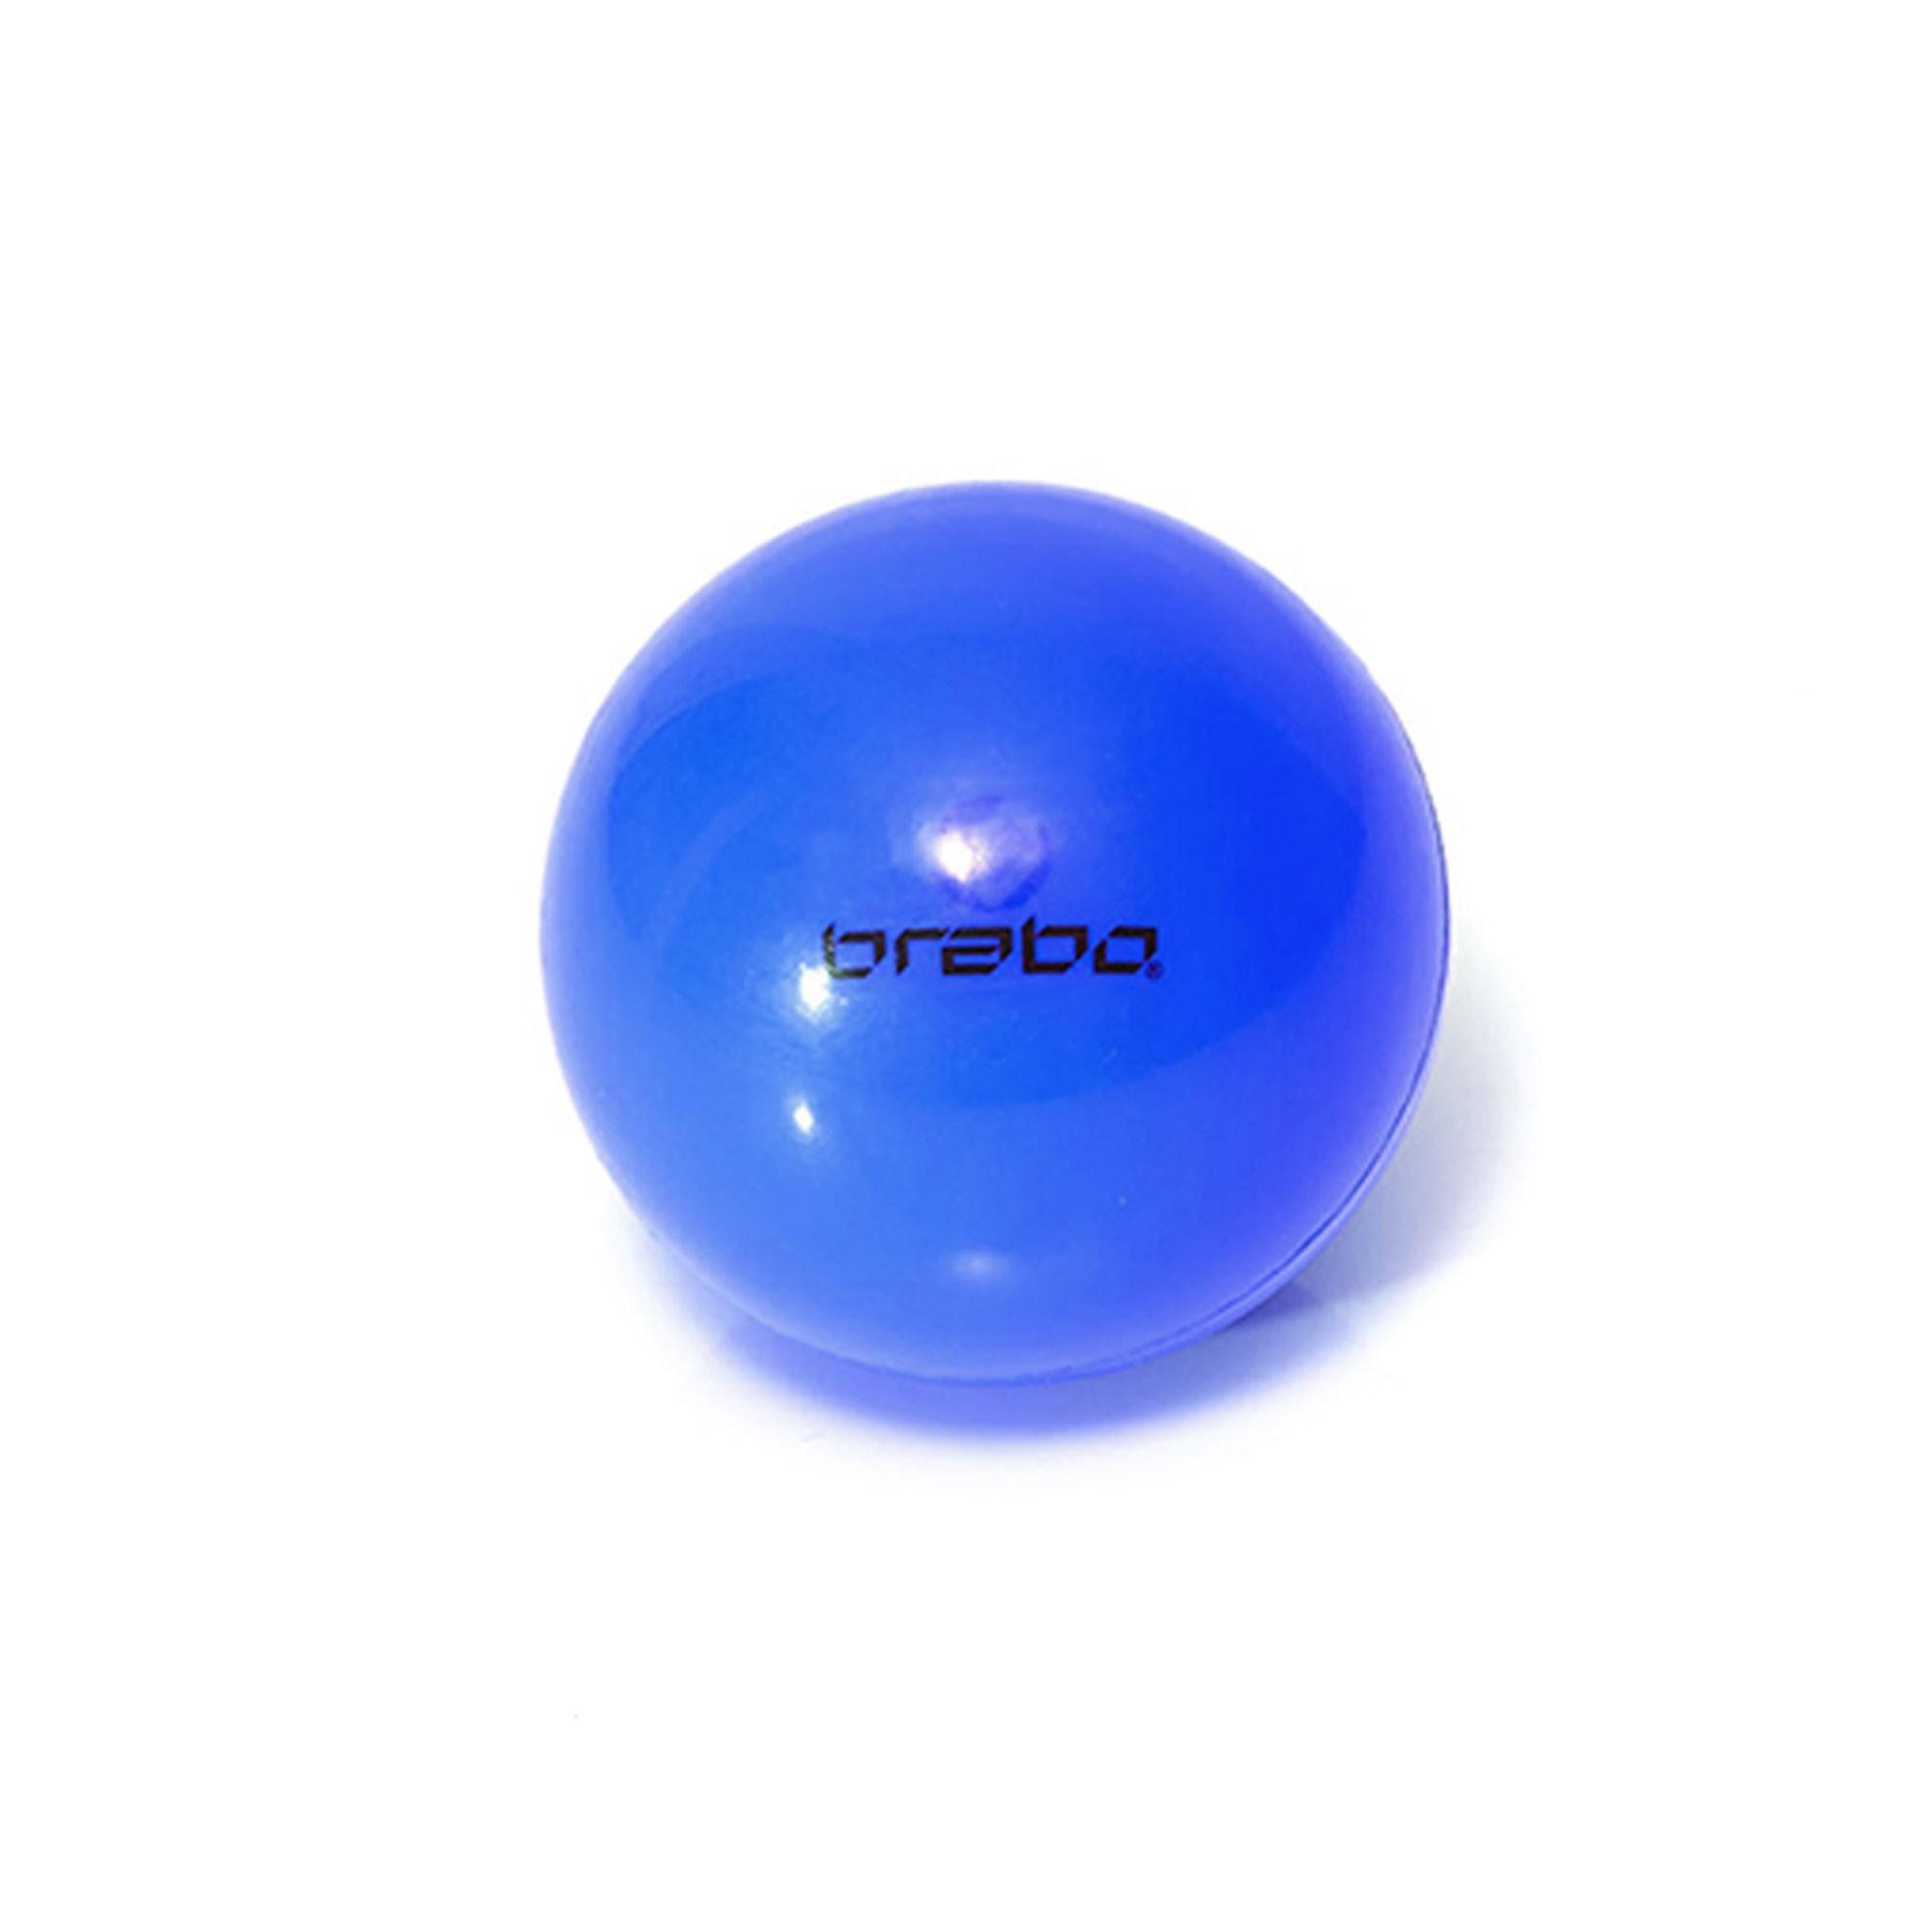 Afbeelding van Brabo Comp Ball Hockeybal Blue